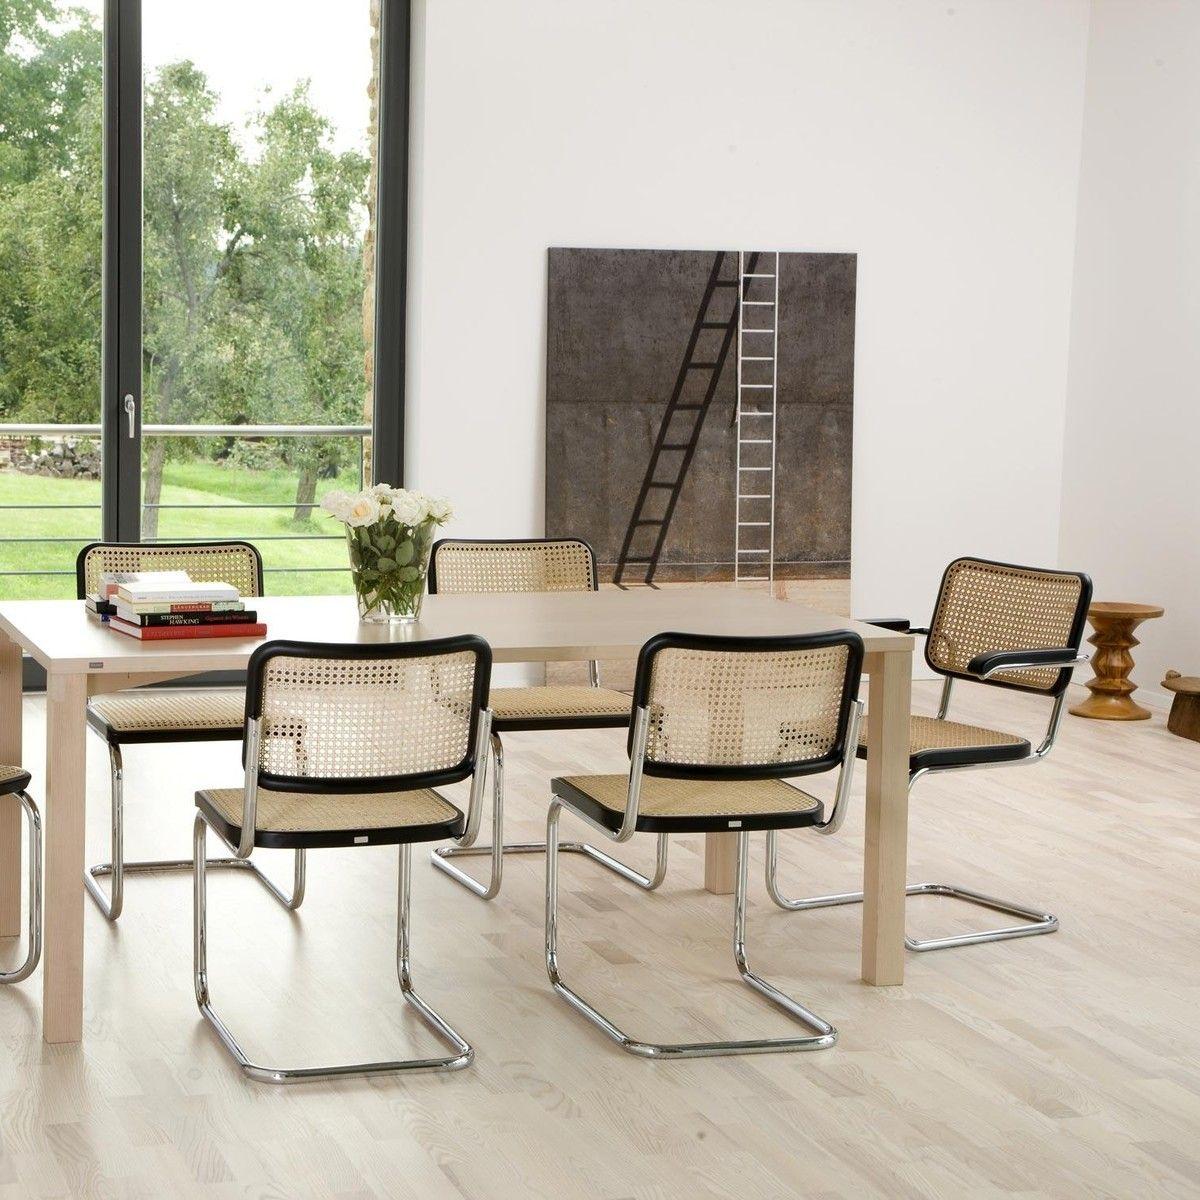 Thonet S 32 V Freischwinger Stuhl Mit Rohrgeflecht Dining Chairs Cesca Chair Home Decor